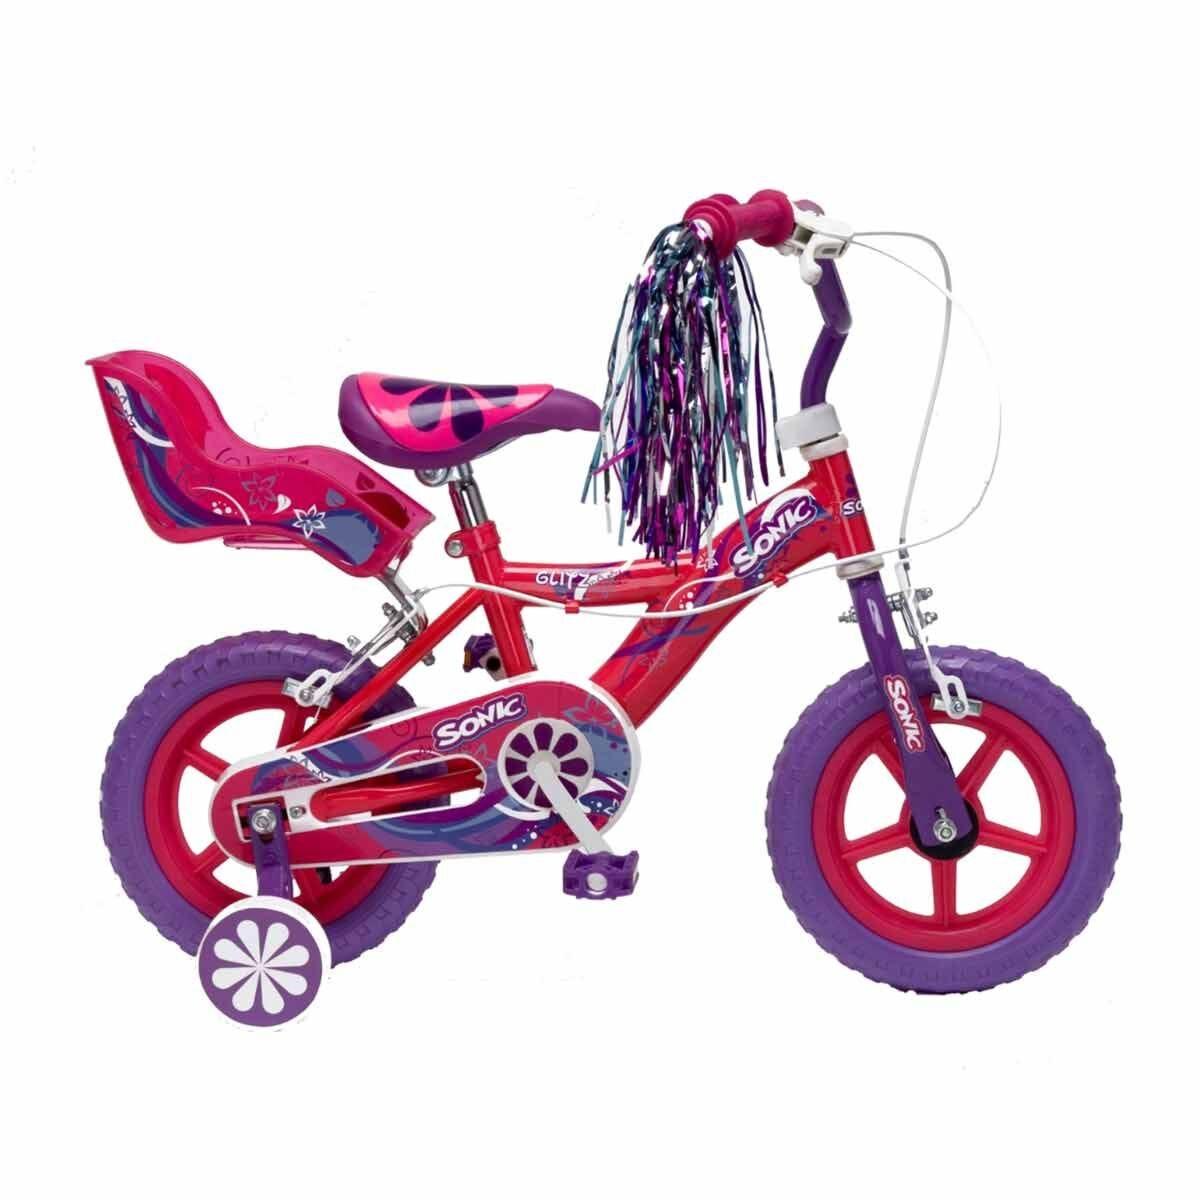 Sonic Glitz Girls Bike 12 Inch Wheel